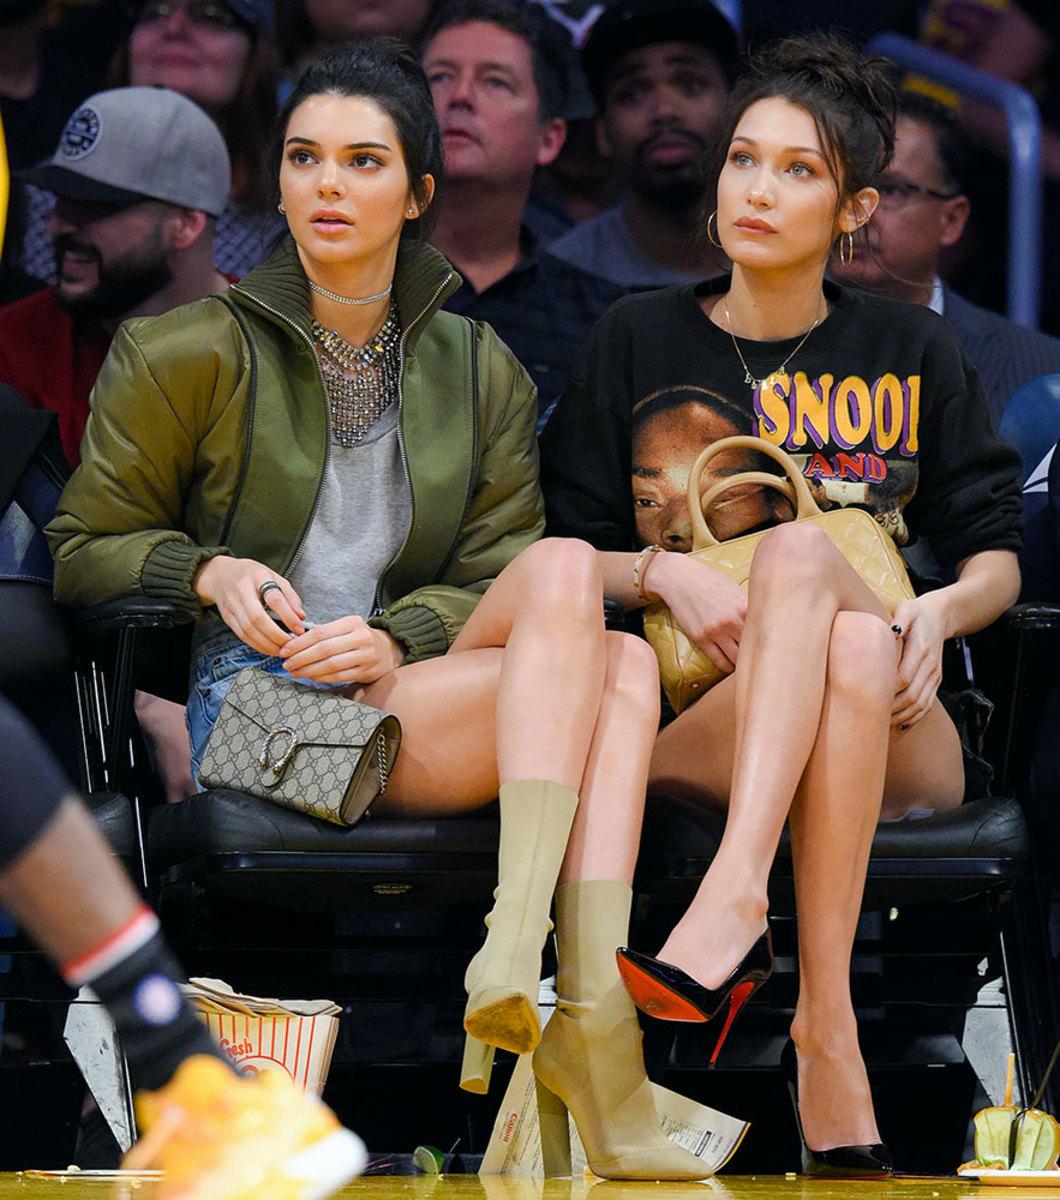 2016-1108-Kendall-Jenner-Bella-Hadid.jpg